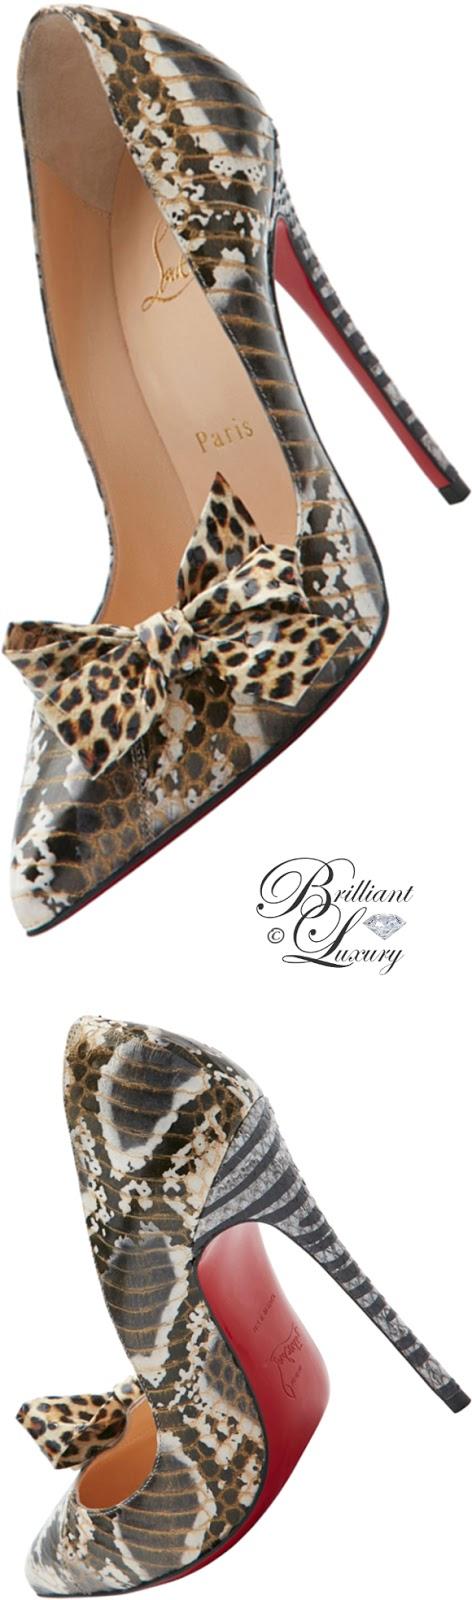 Brilliant Luxury ♦ Christian Louboutin Madame Menodo snakeskin pumps